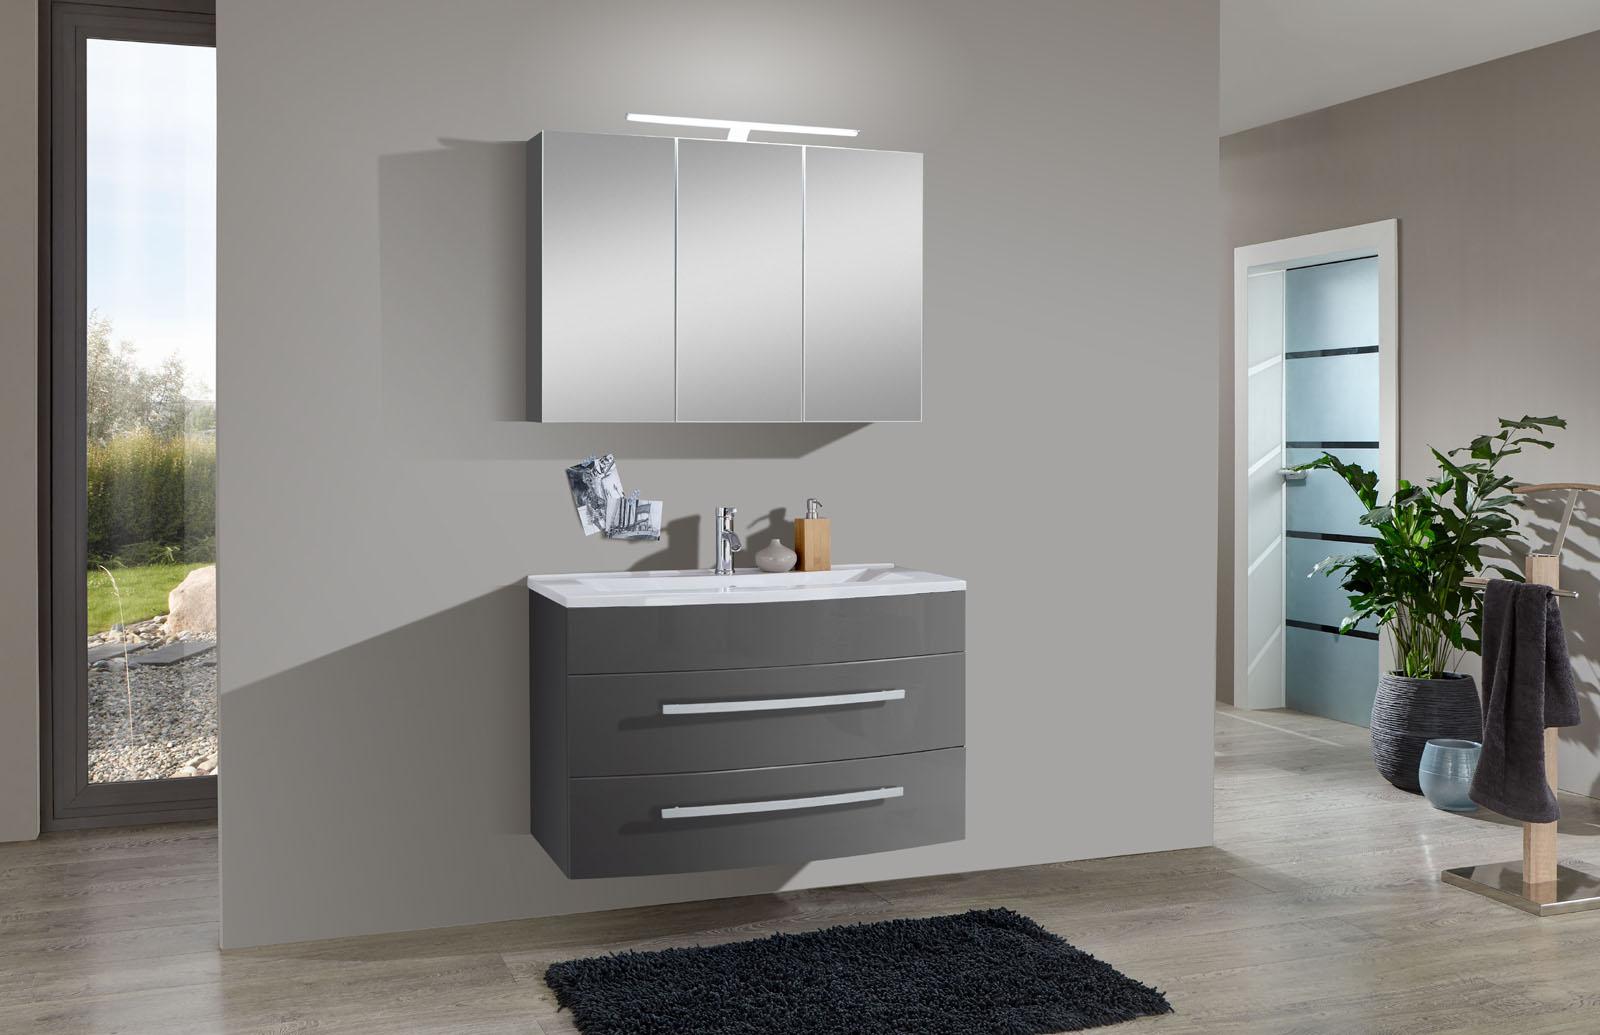 SAM® 2tlg Badezimmer Set Hochglanz Grau 100cm Genf